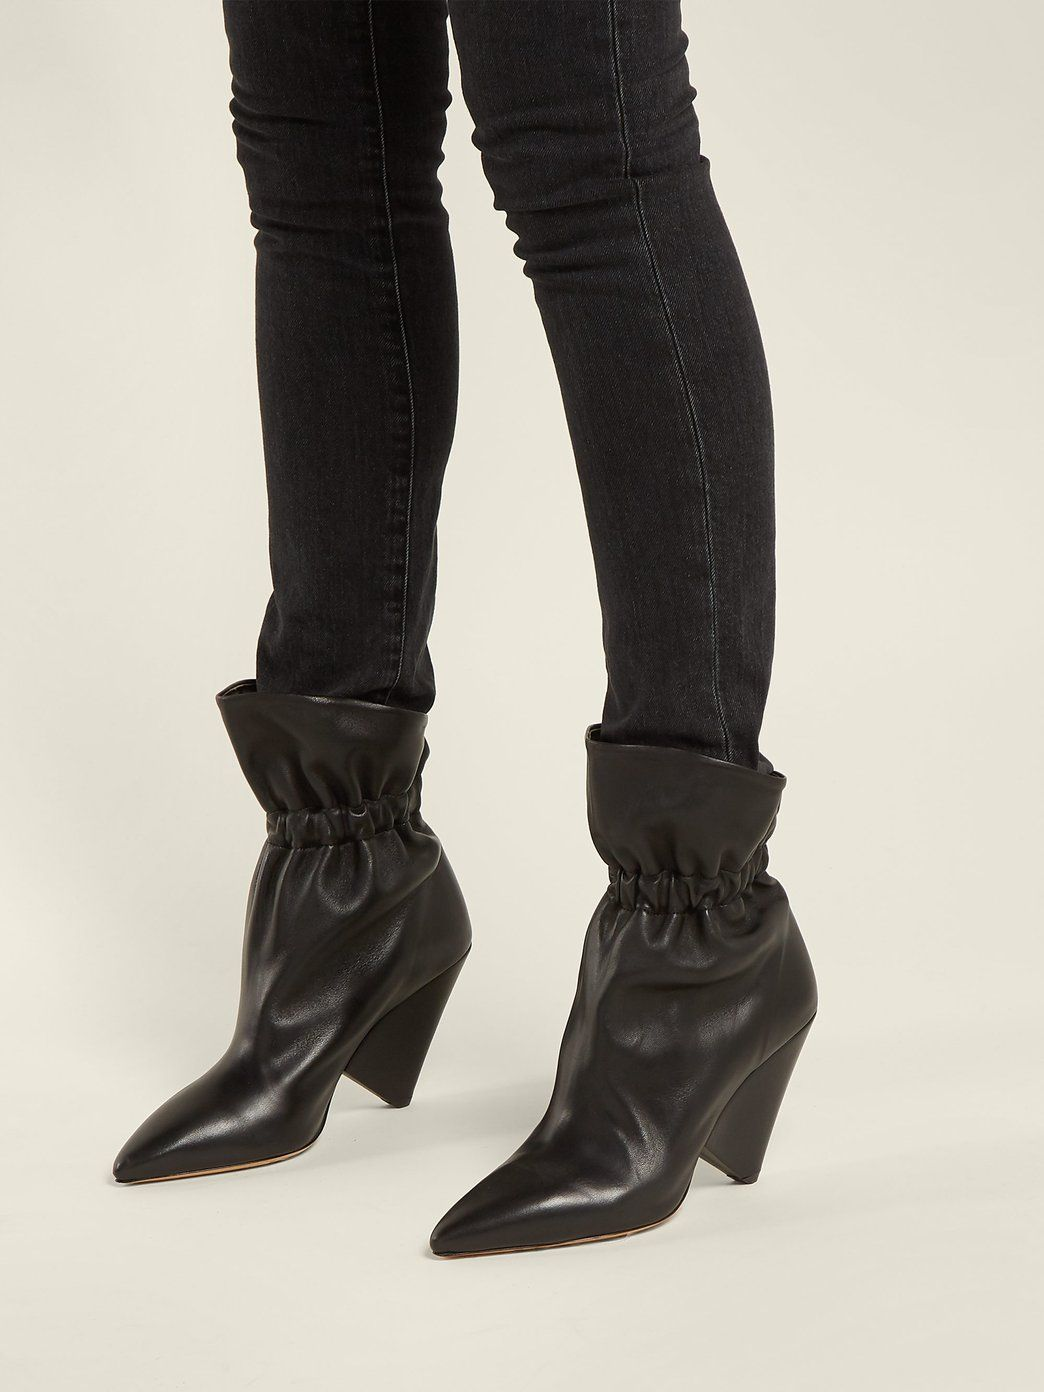 6e96b85aa28 Lileas leather ankle boots | Isabel Marant | MATCHESFASHION.COM UK ...